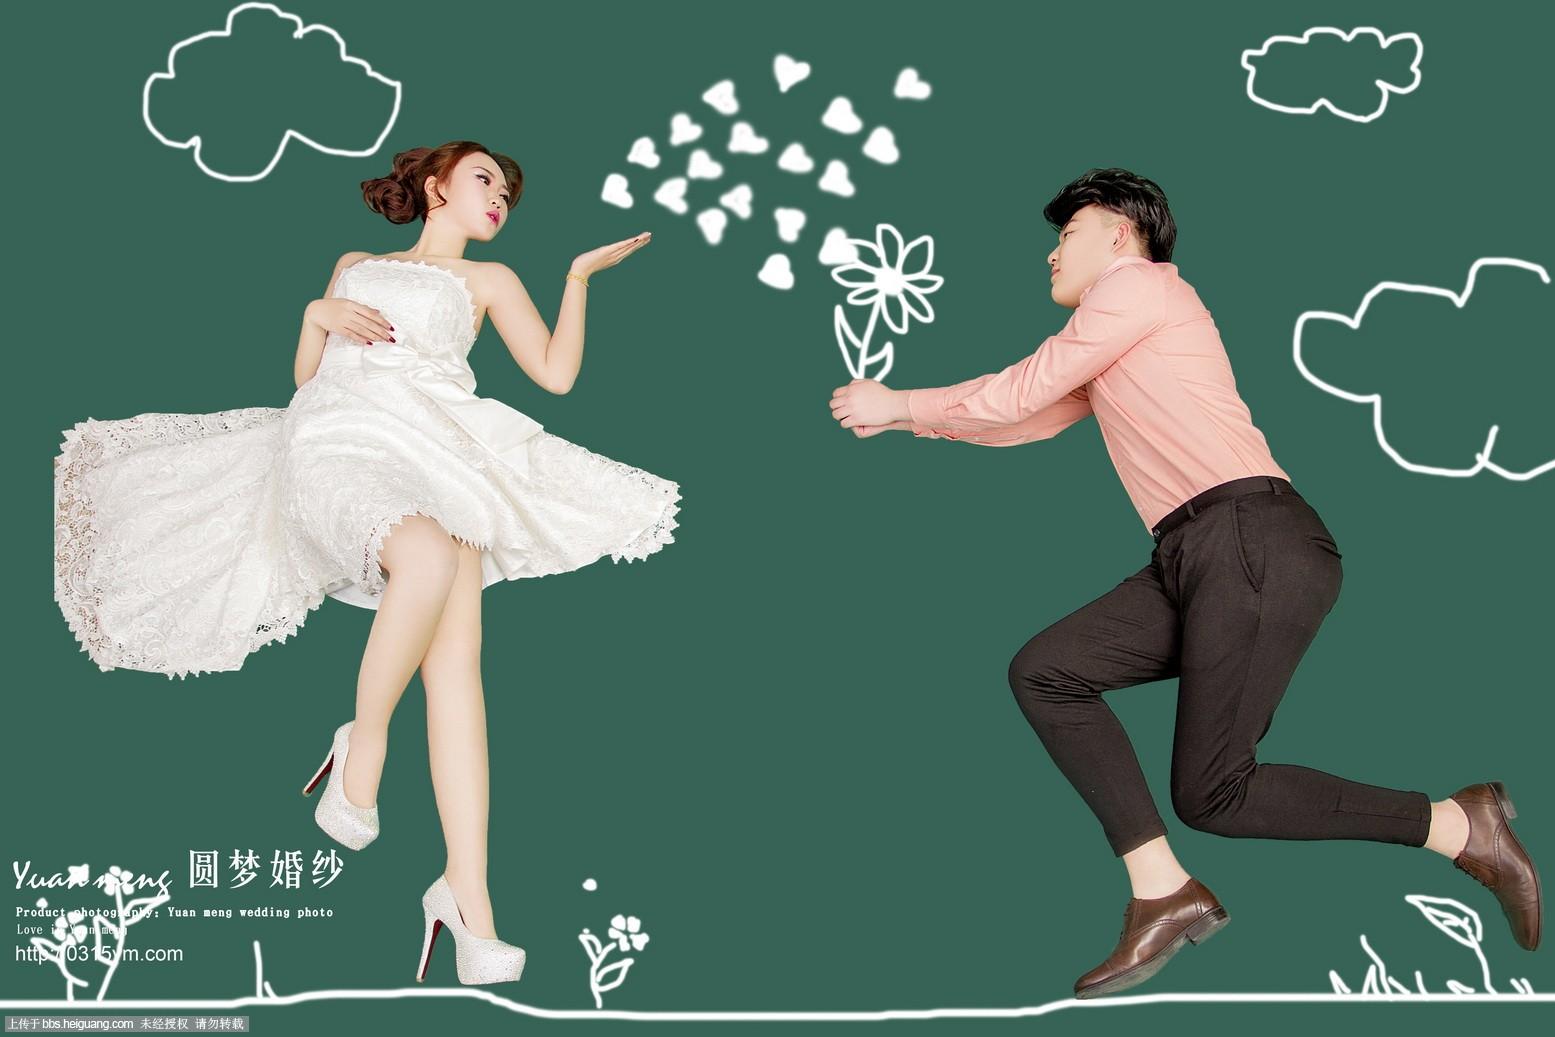 阿沐修图——涂鸦婚纱照